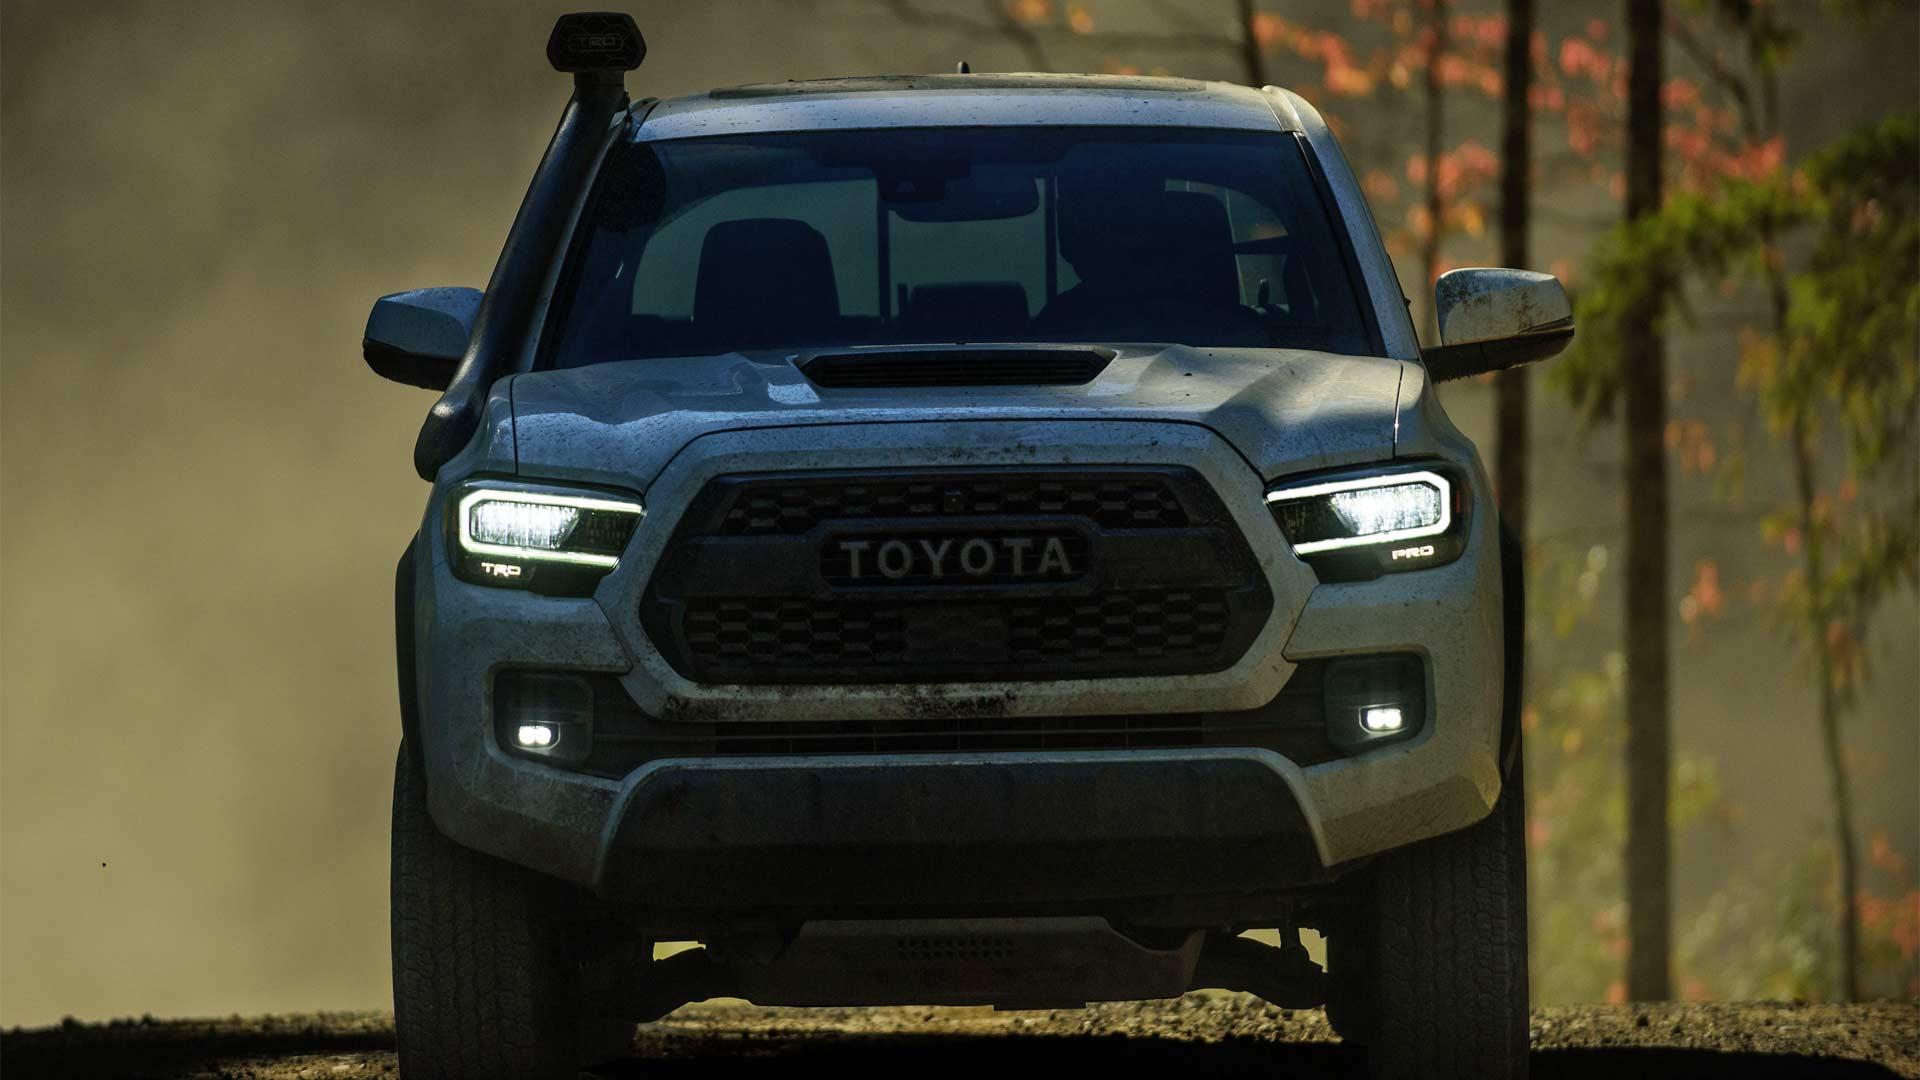 2020 Toyota RAV4 and Tacoma receive TRD treatment - Autodevot